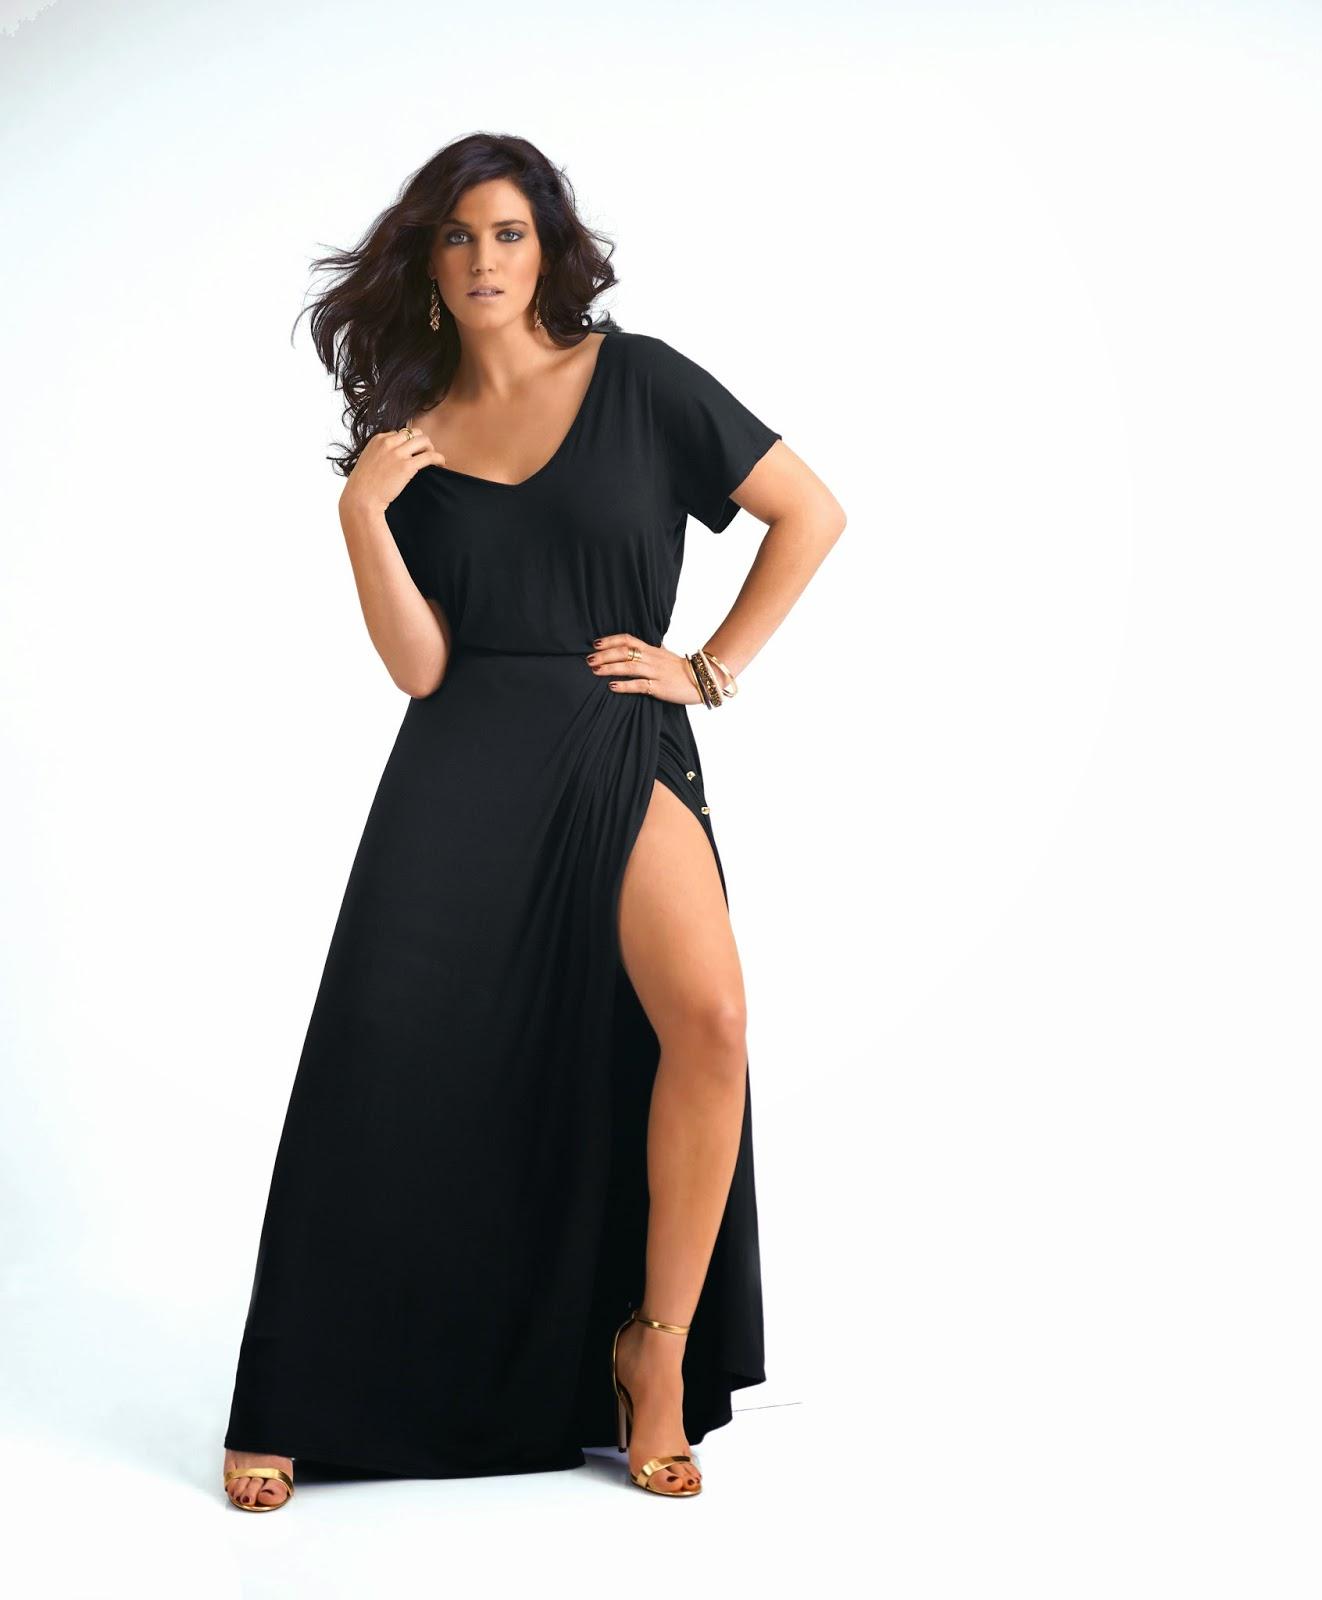 robes l gantes france robe longue d 39 ete pour femme ronde. Black Bedroom Furniture Sets. Home Design Ideas